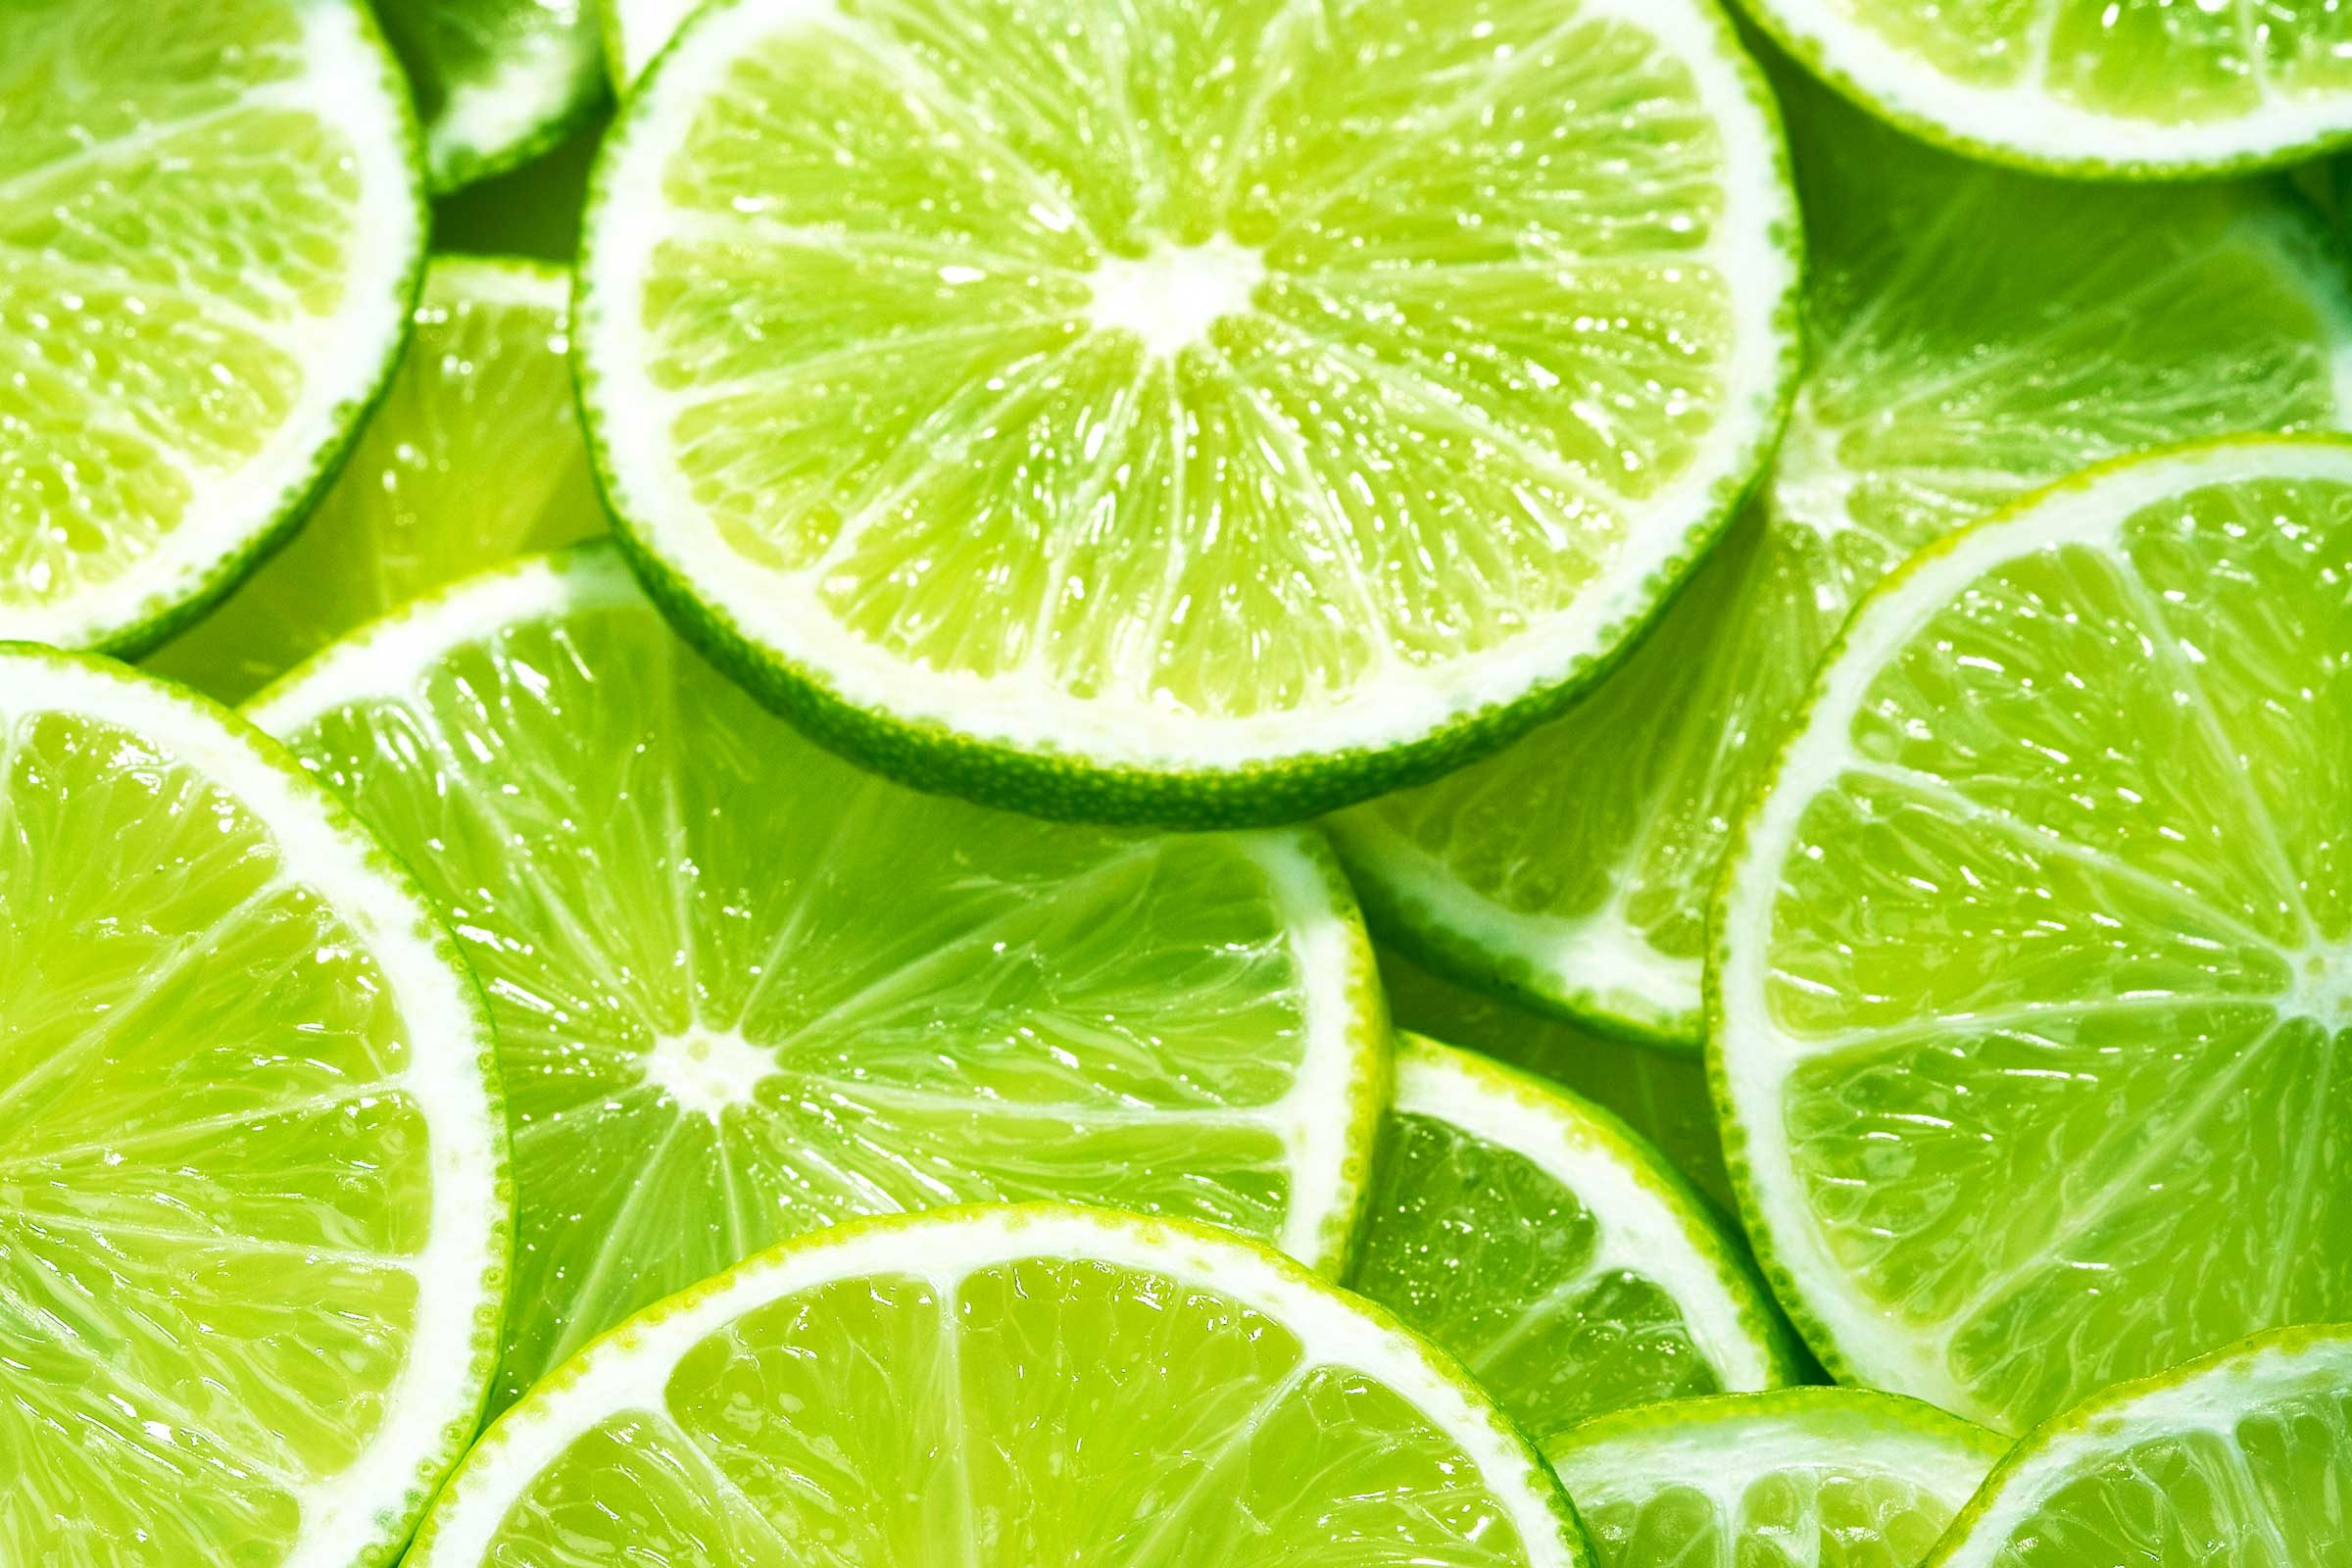 Perks of a Plant-Based Diet: 12 Powerful Nutrients That Slay Disease